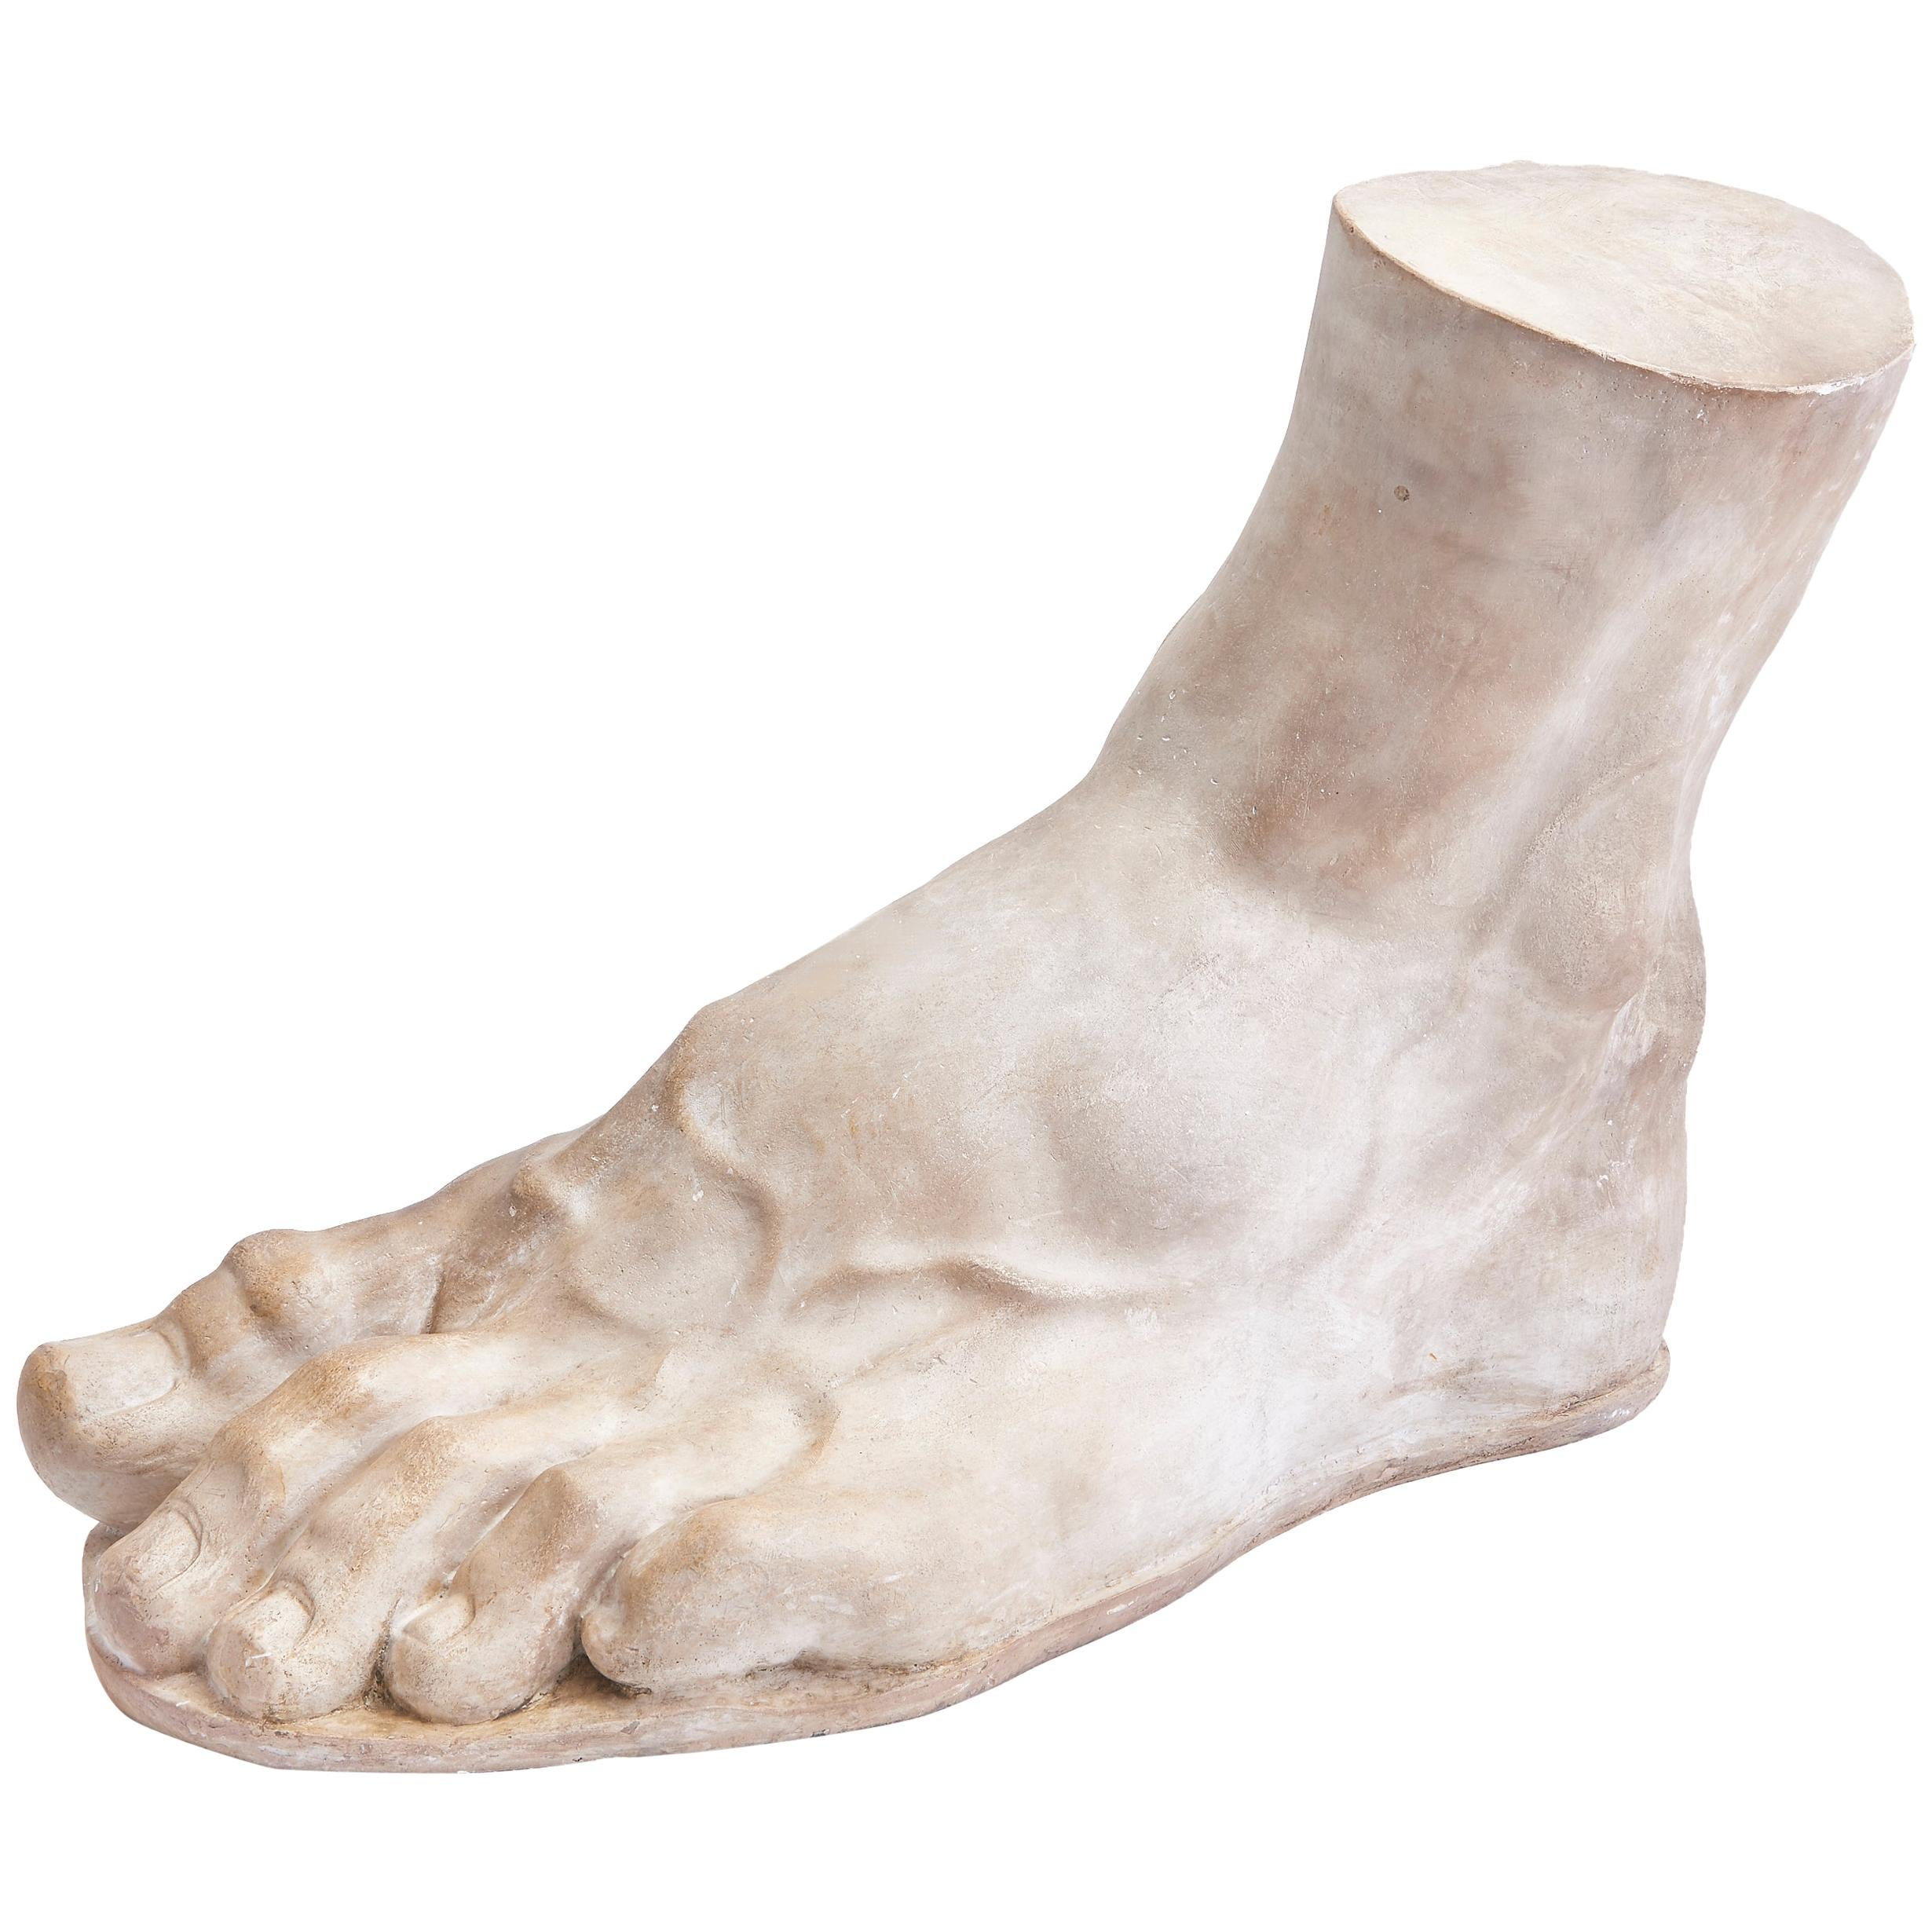 Italian Plaster Cast of the Foot of the Emperor Constantine, circa 1950